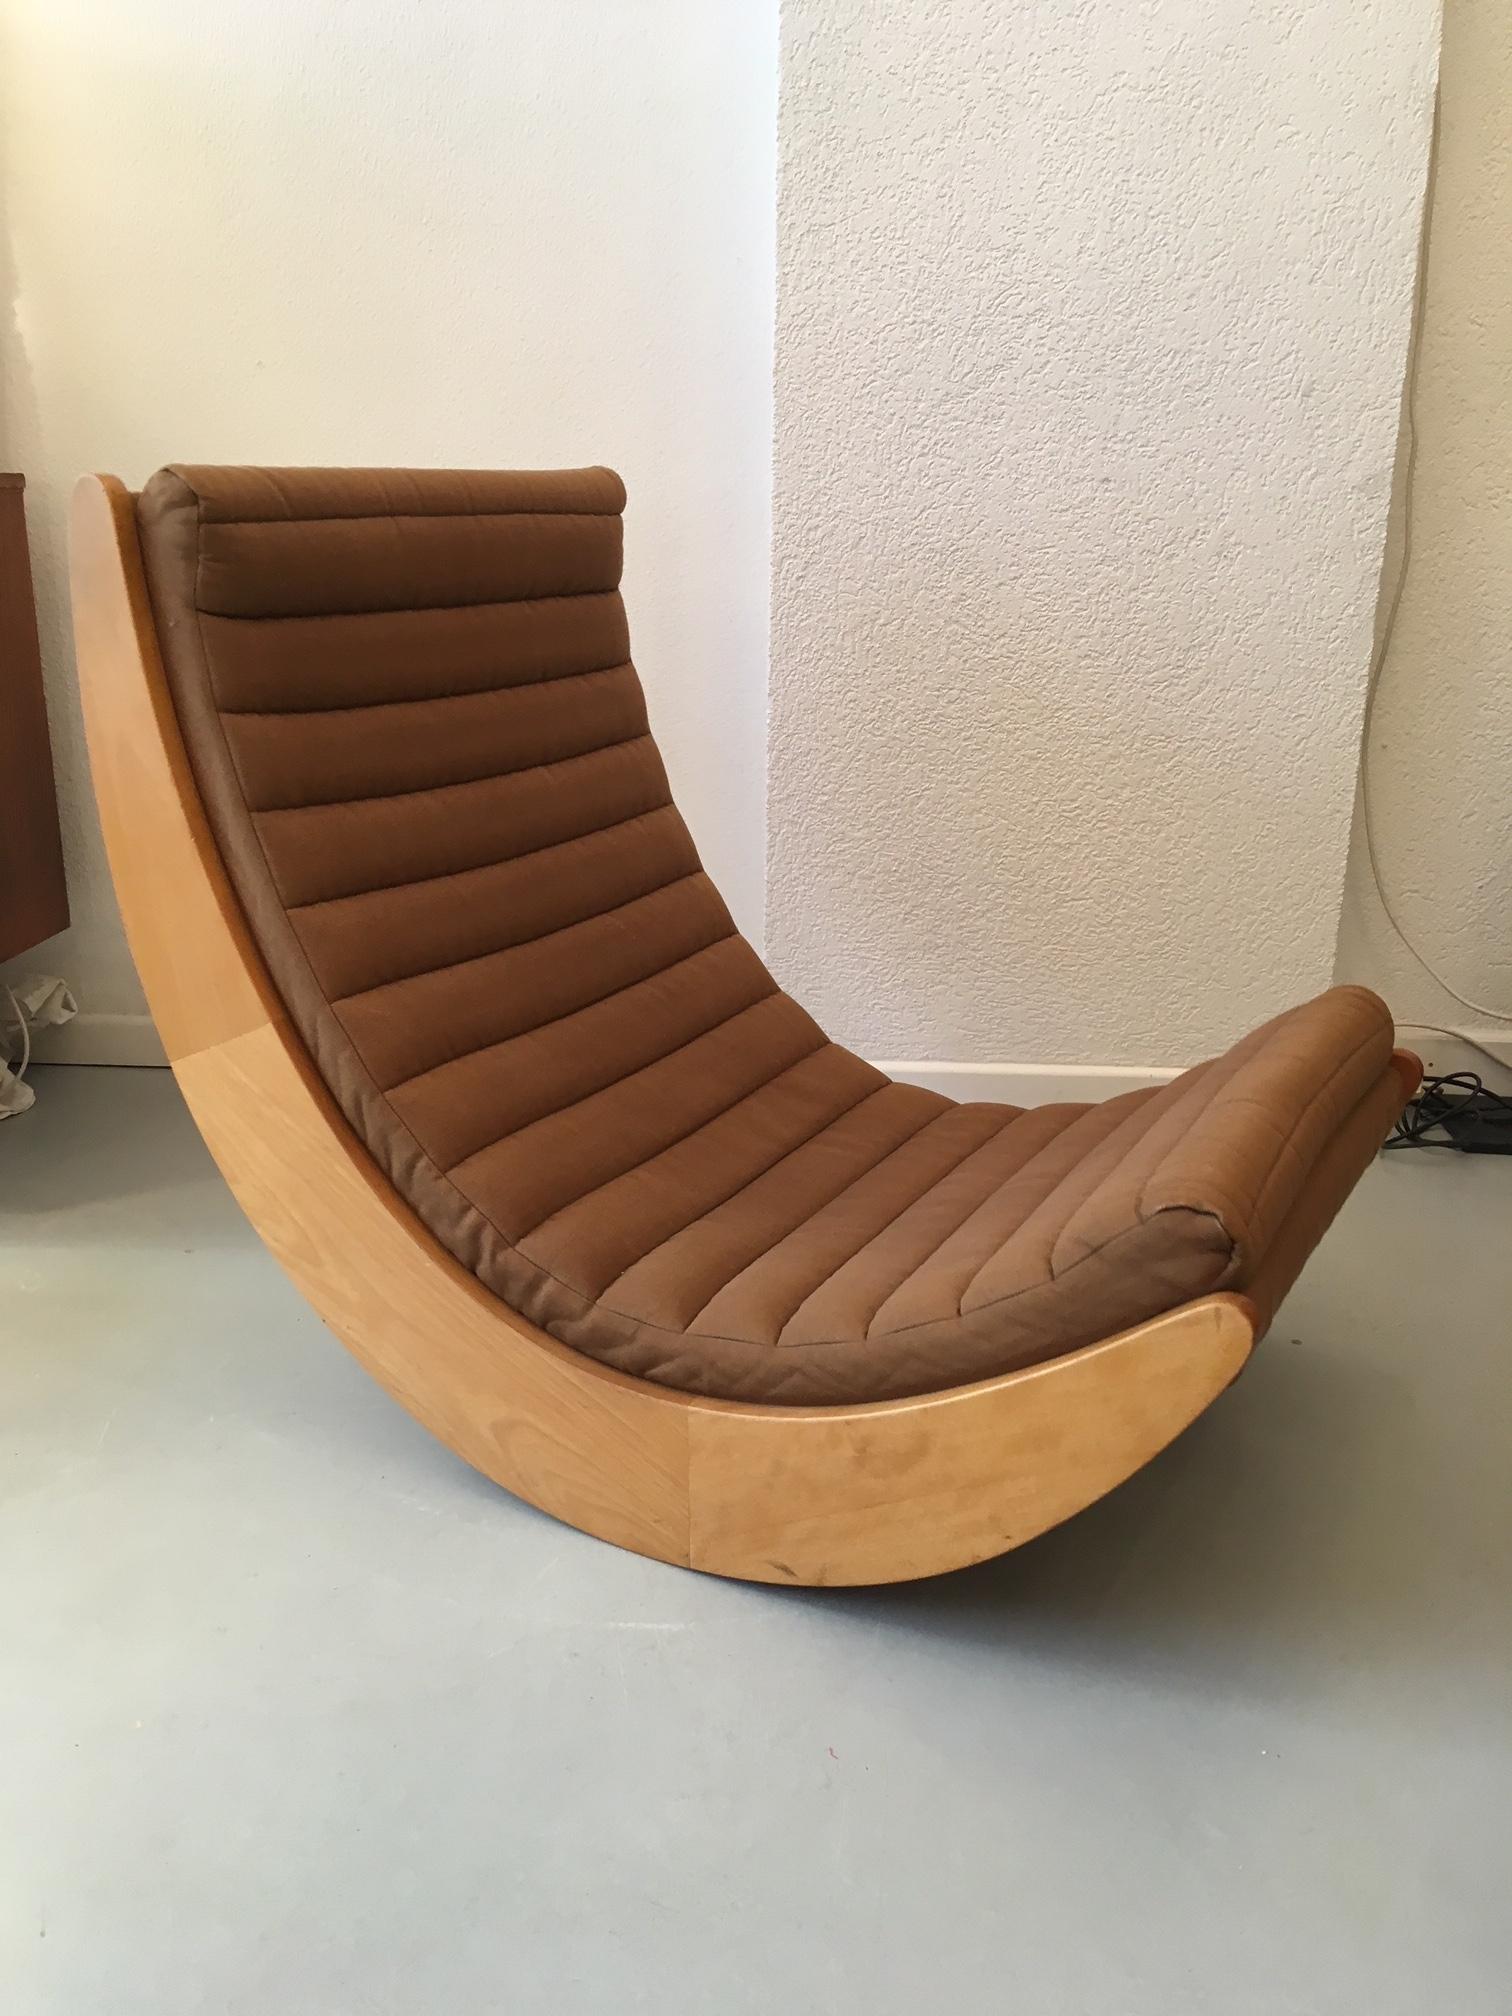 Verner Panton Chaise à Bascule Relaxer